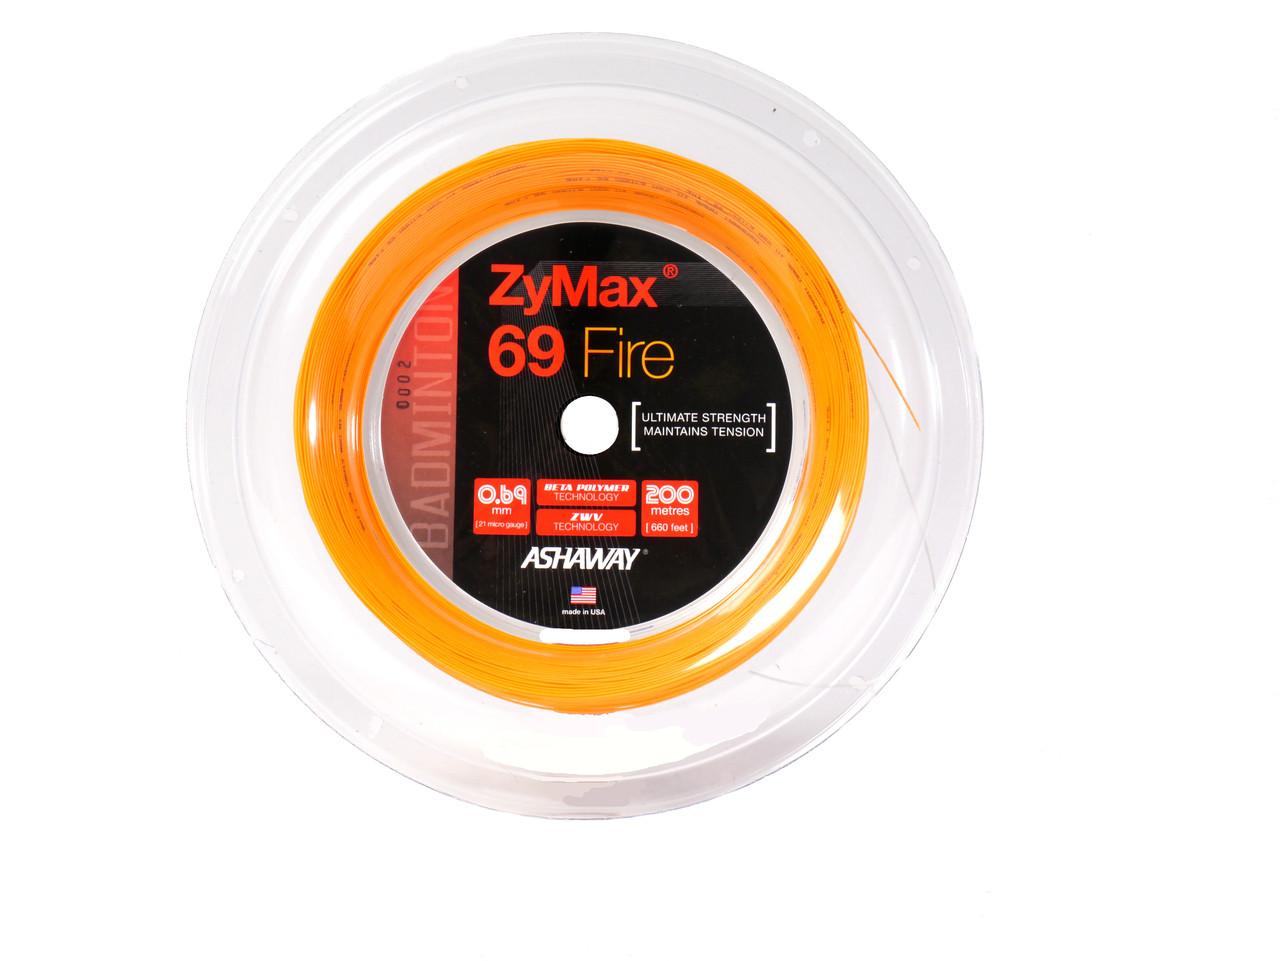 Ashaway Zymax 66 Fire Power Badminton String 200m Reel